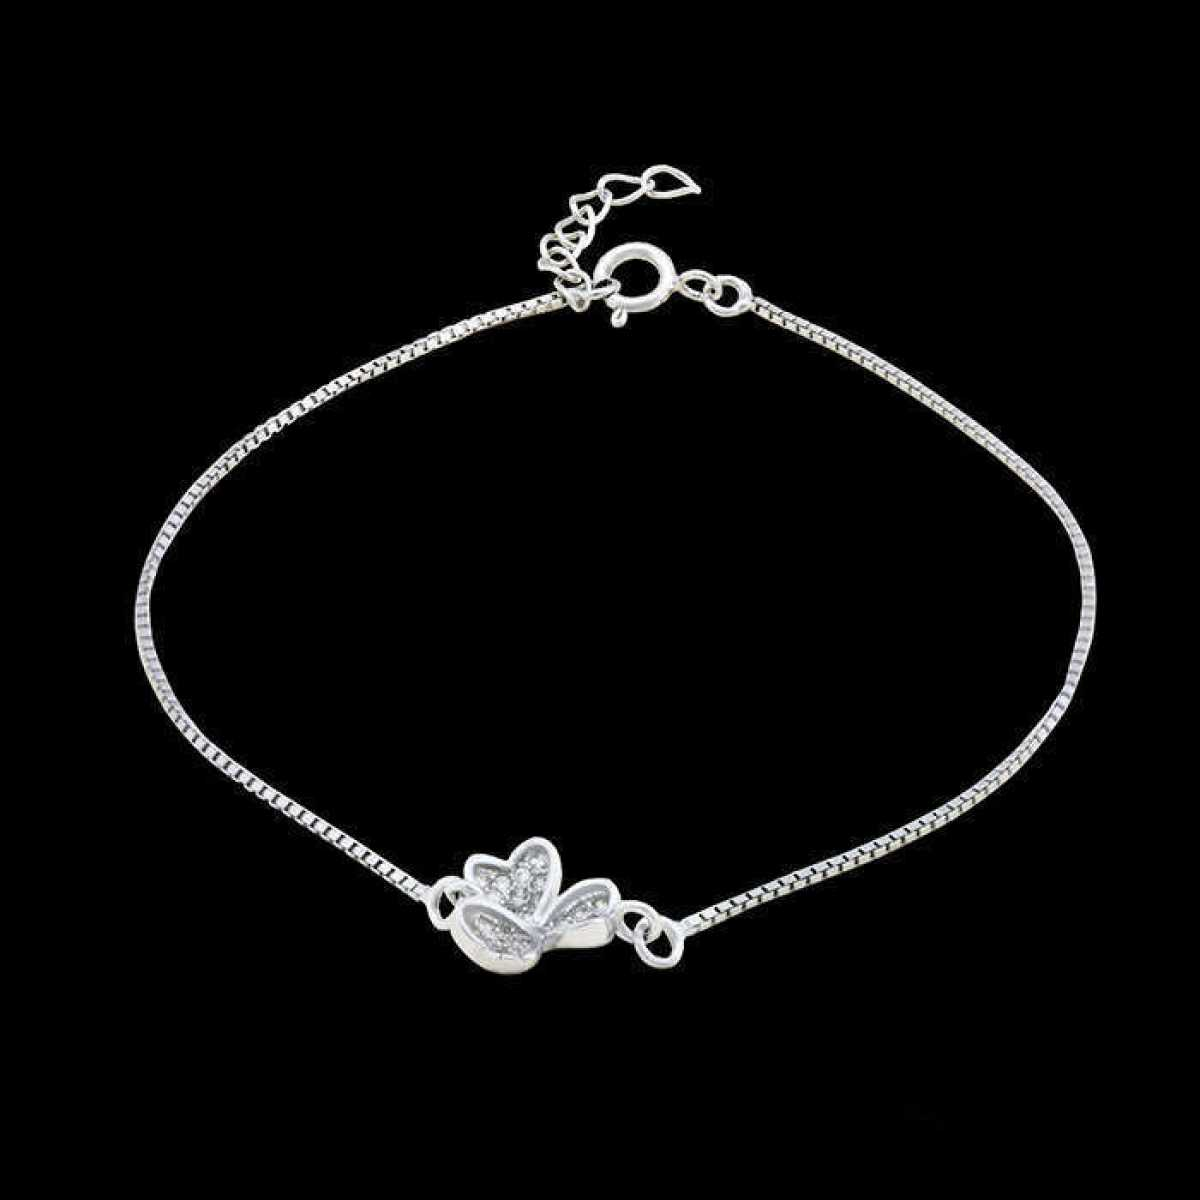 Charm Flower Silver Bracelet